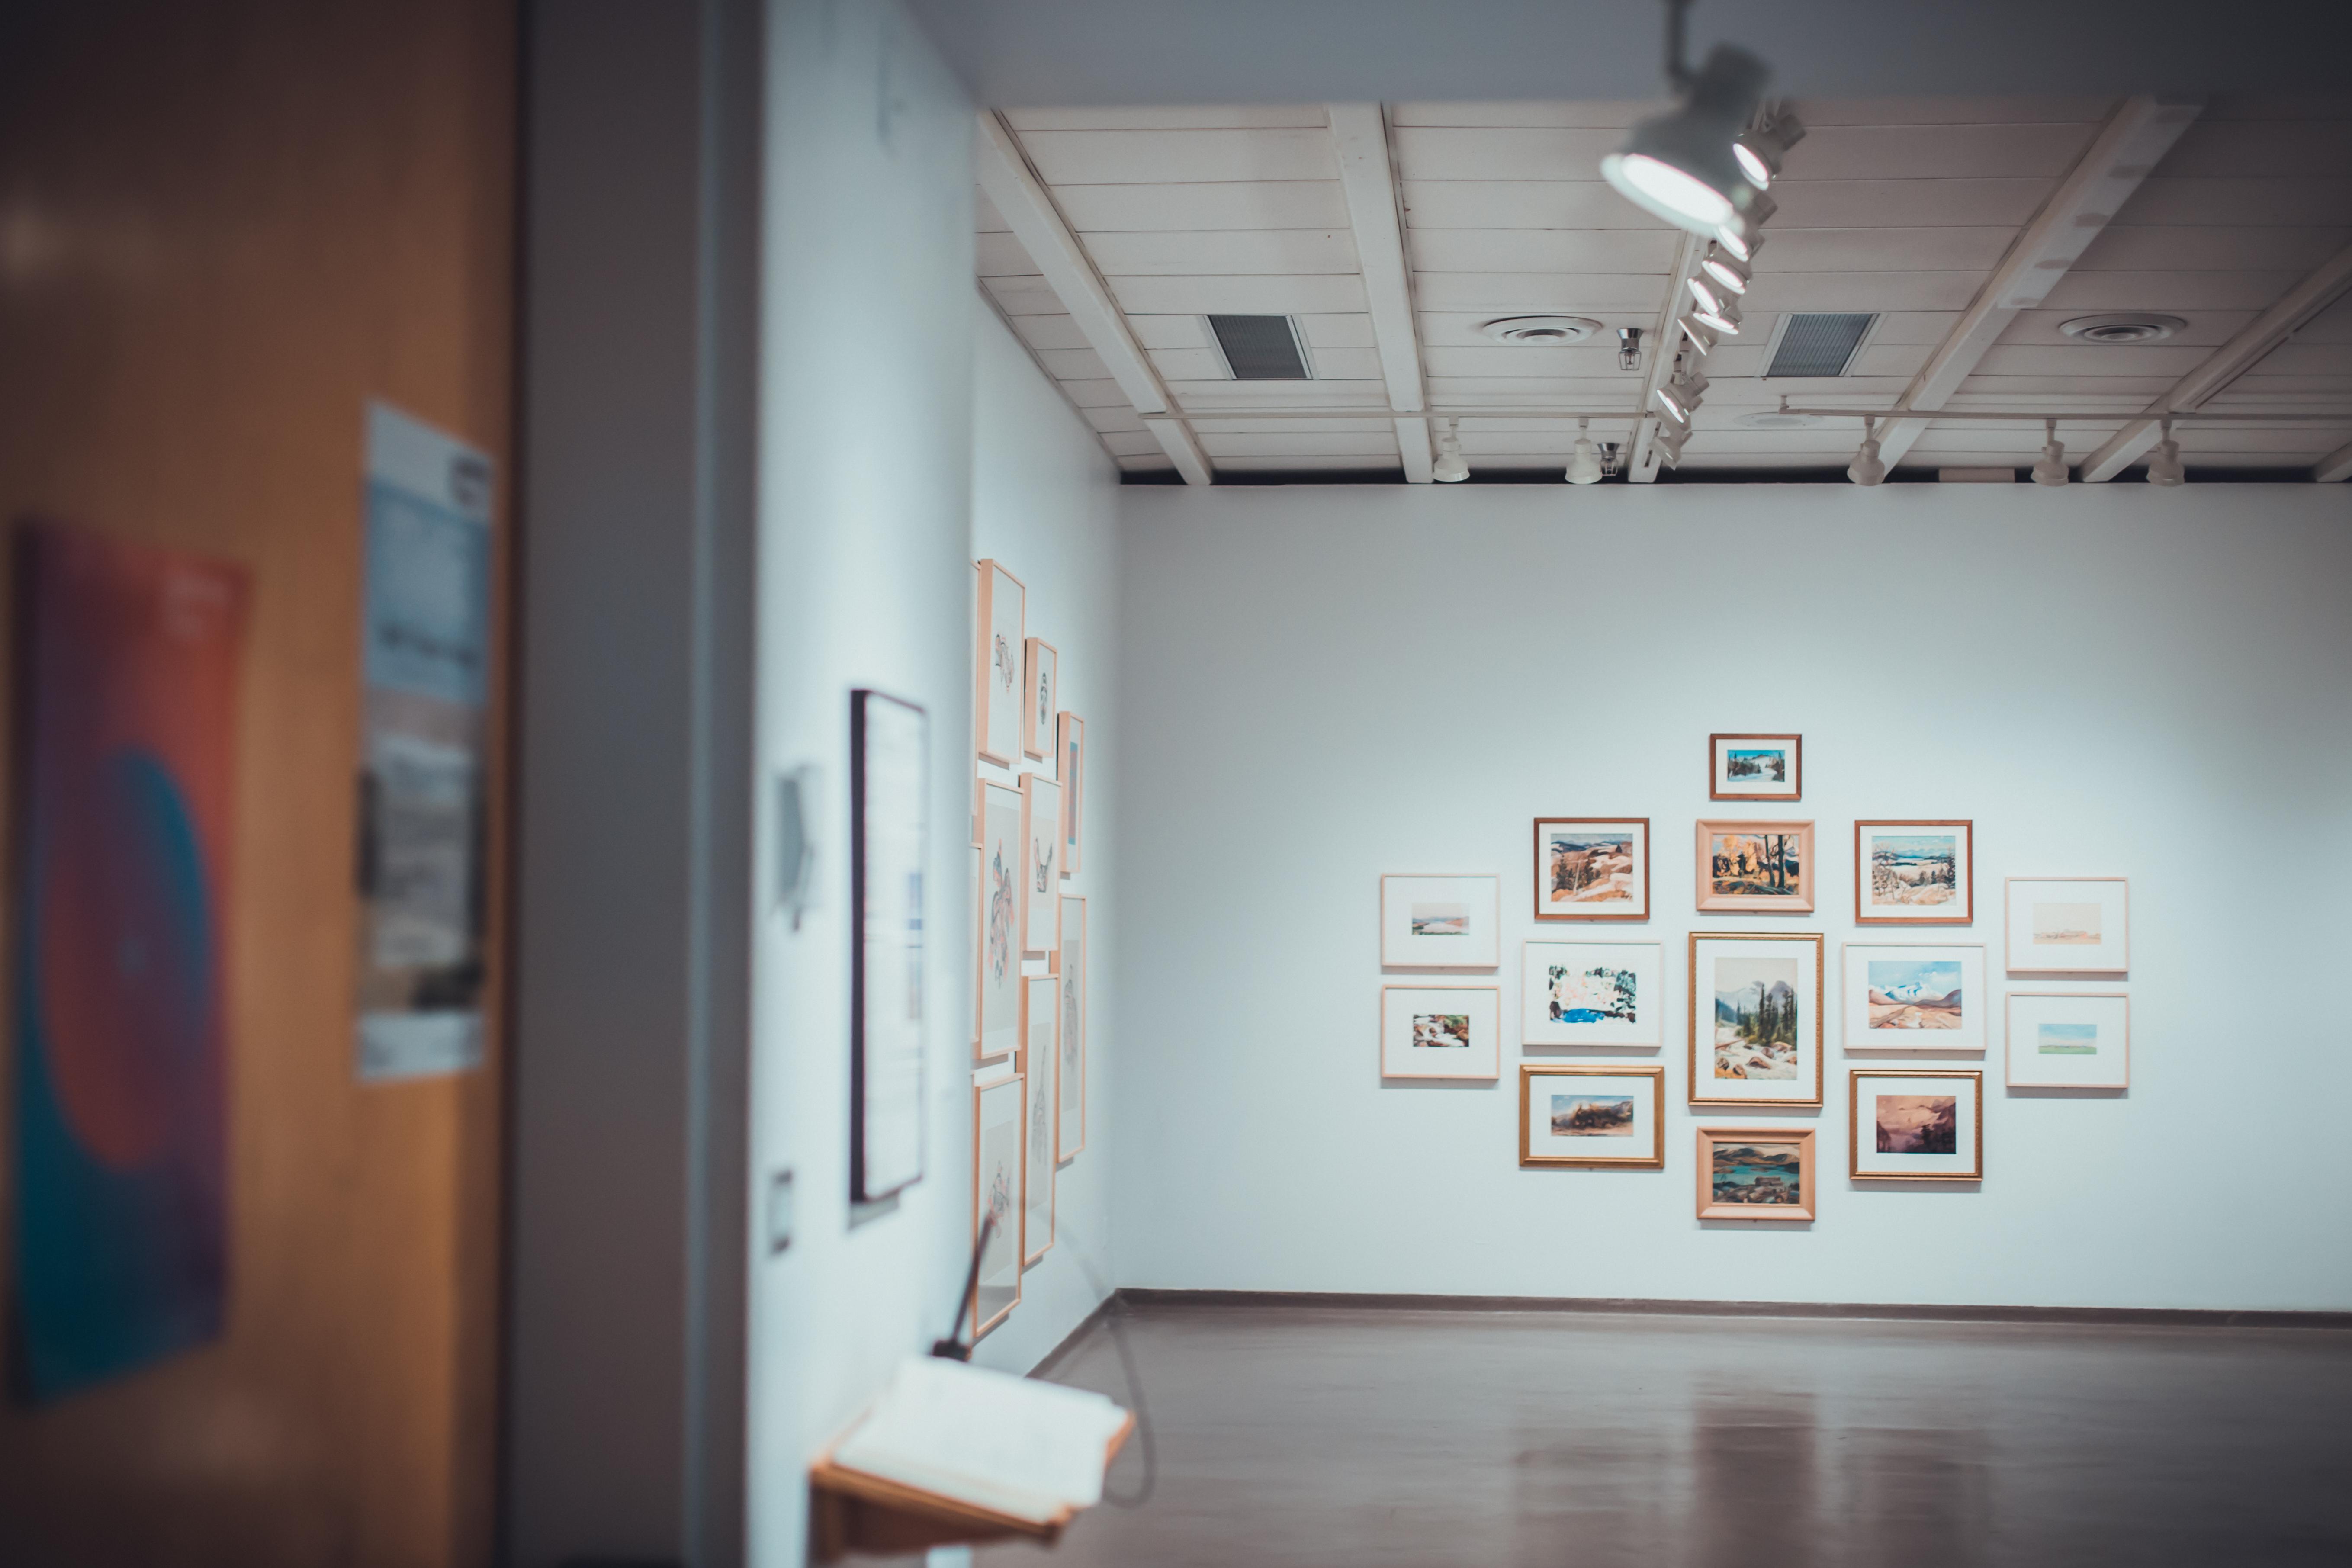 Hess Gallery